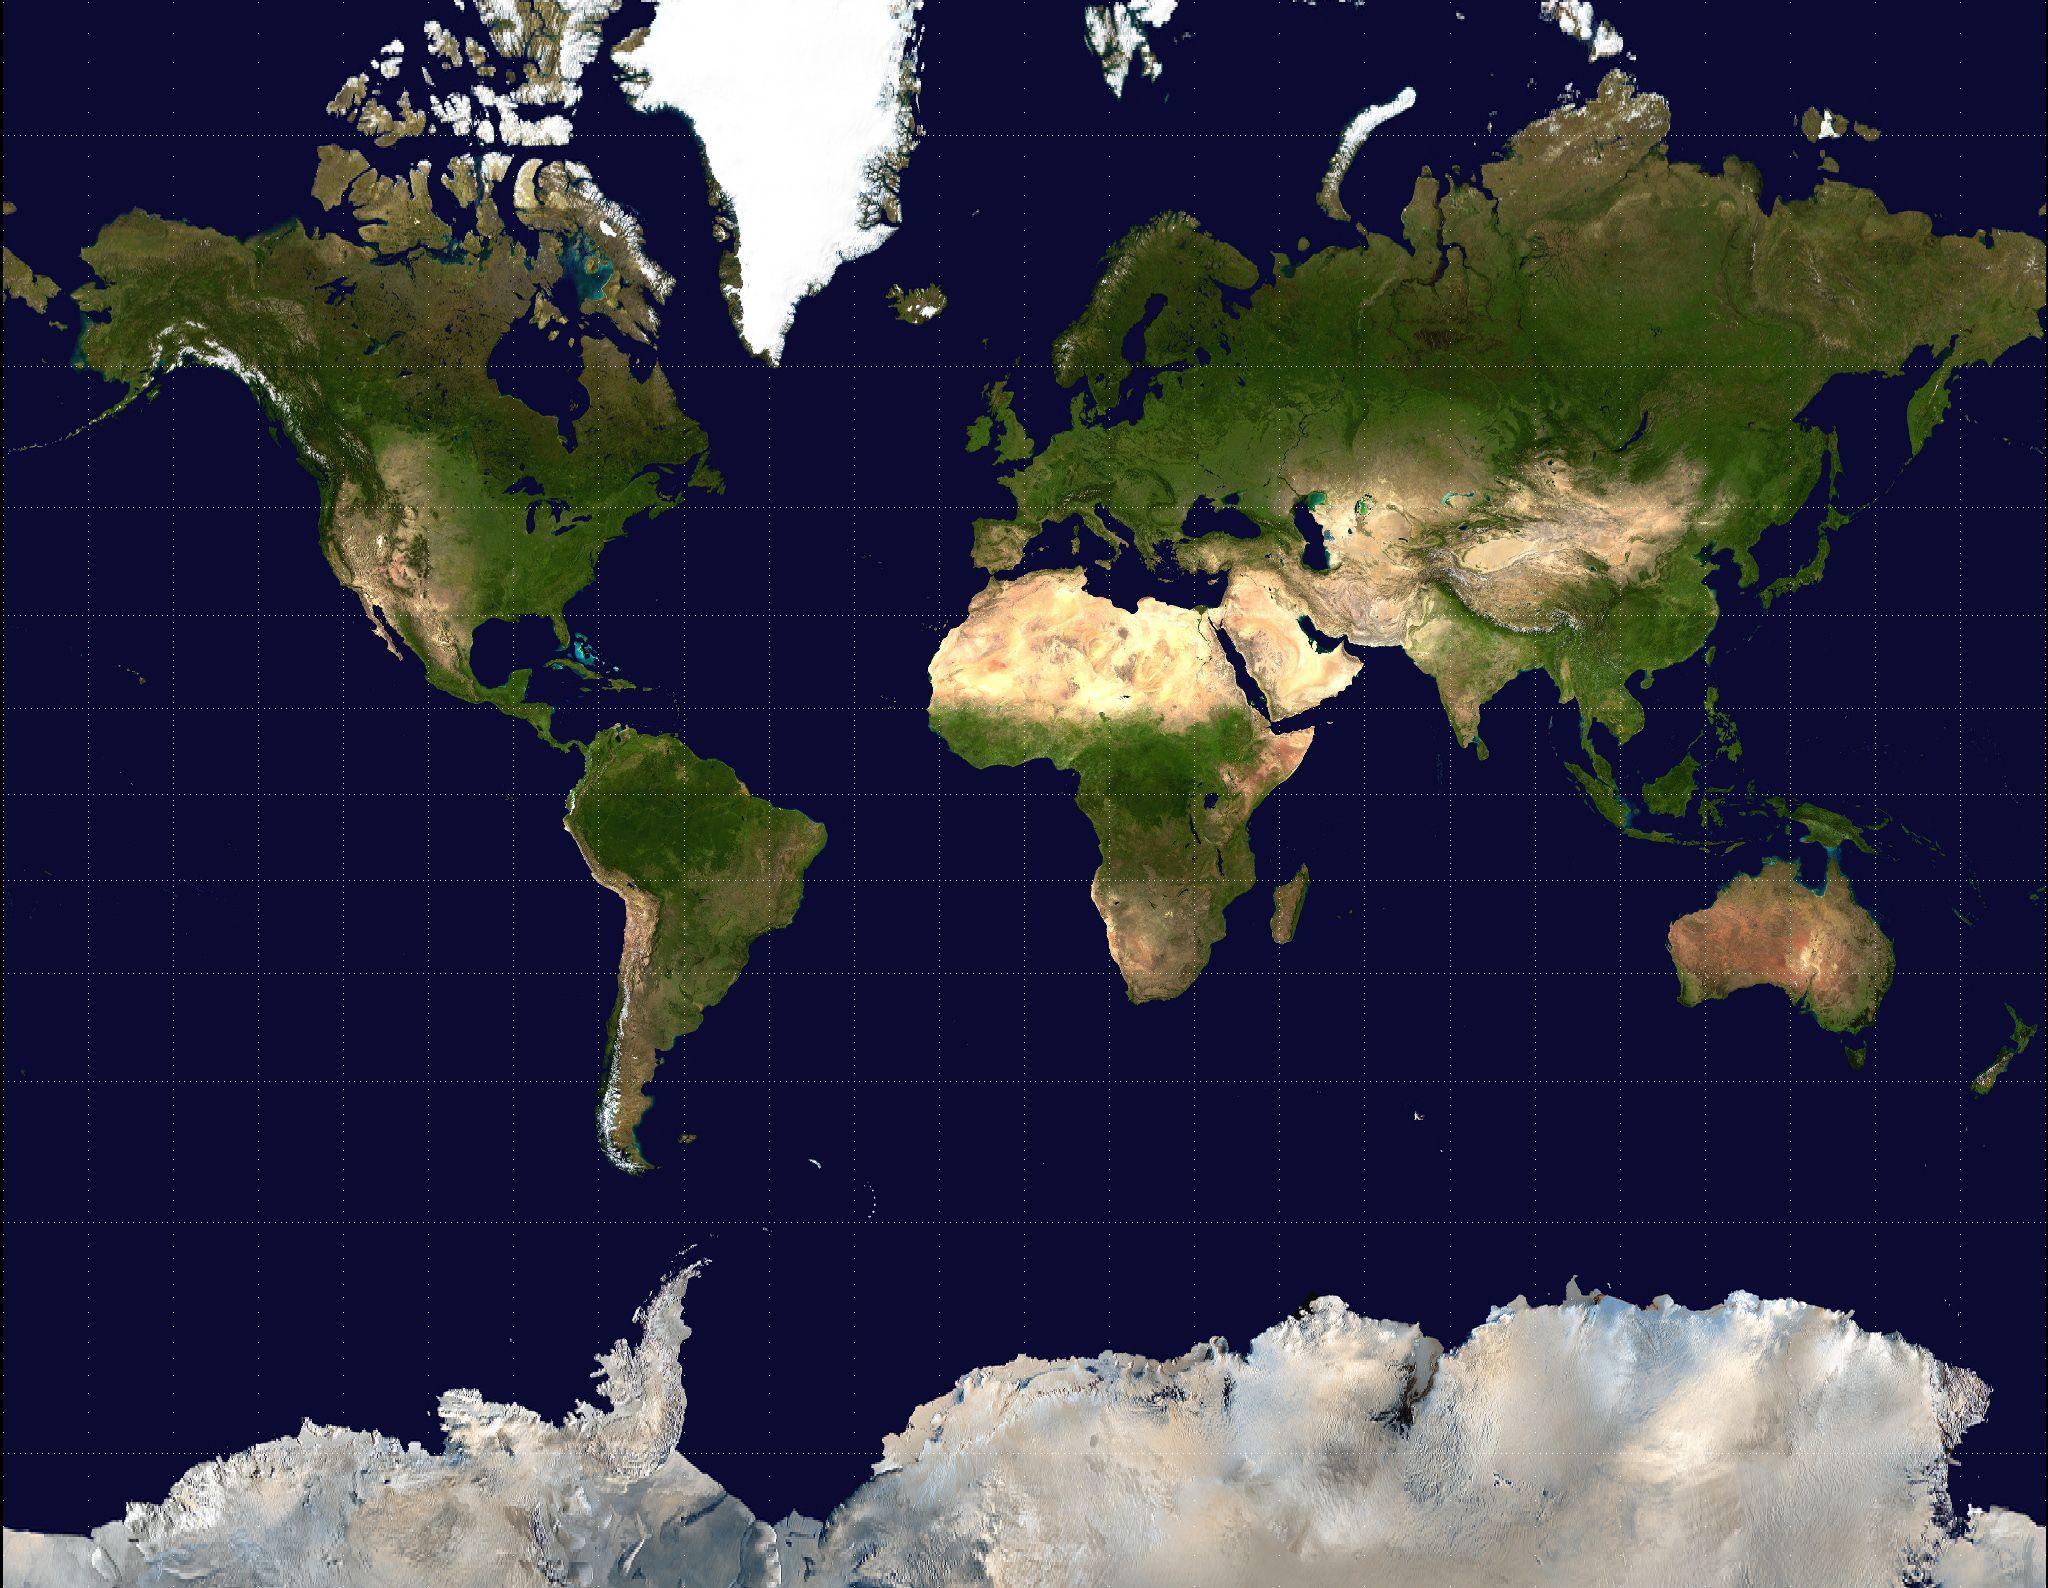 Large satellite map of the worldg 20481588 map pinterest large satellite map of the worldg 2048 gumiabroncs Choice Image